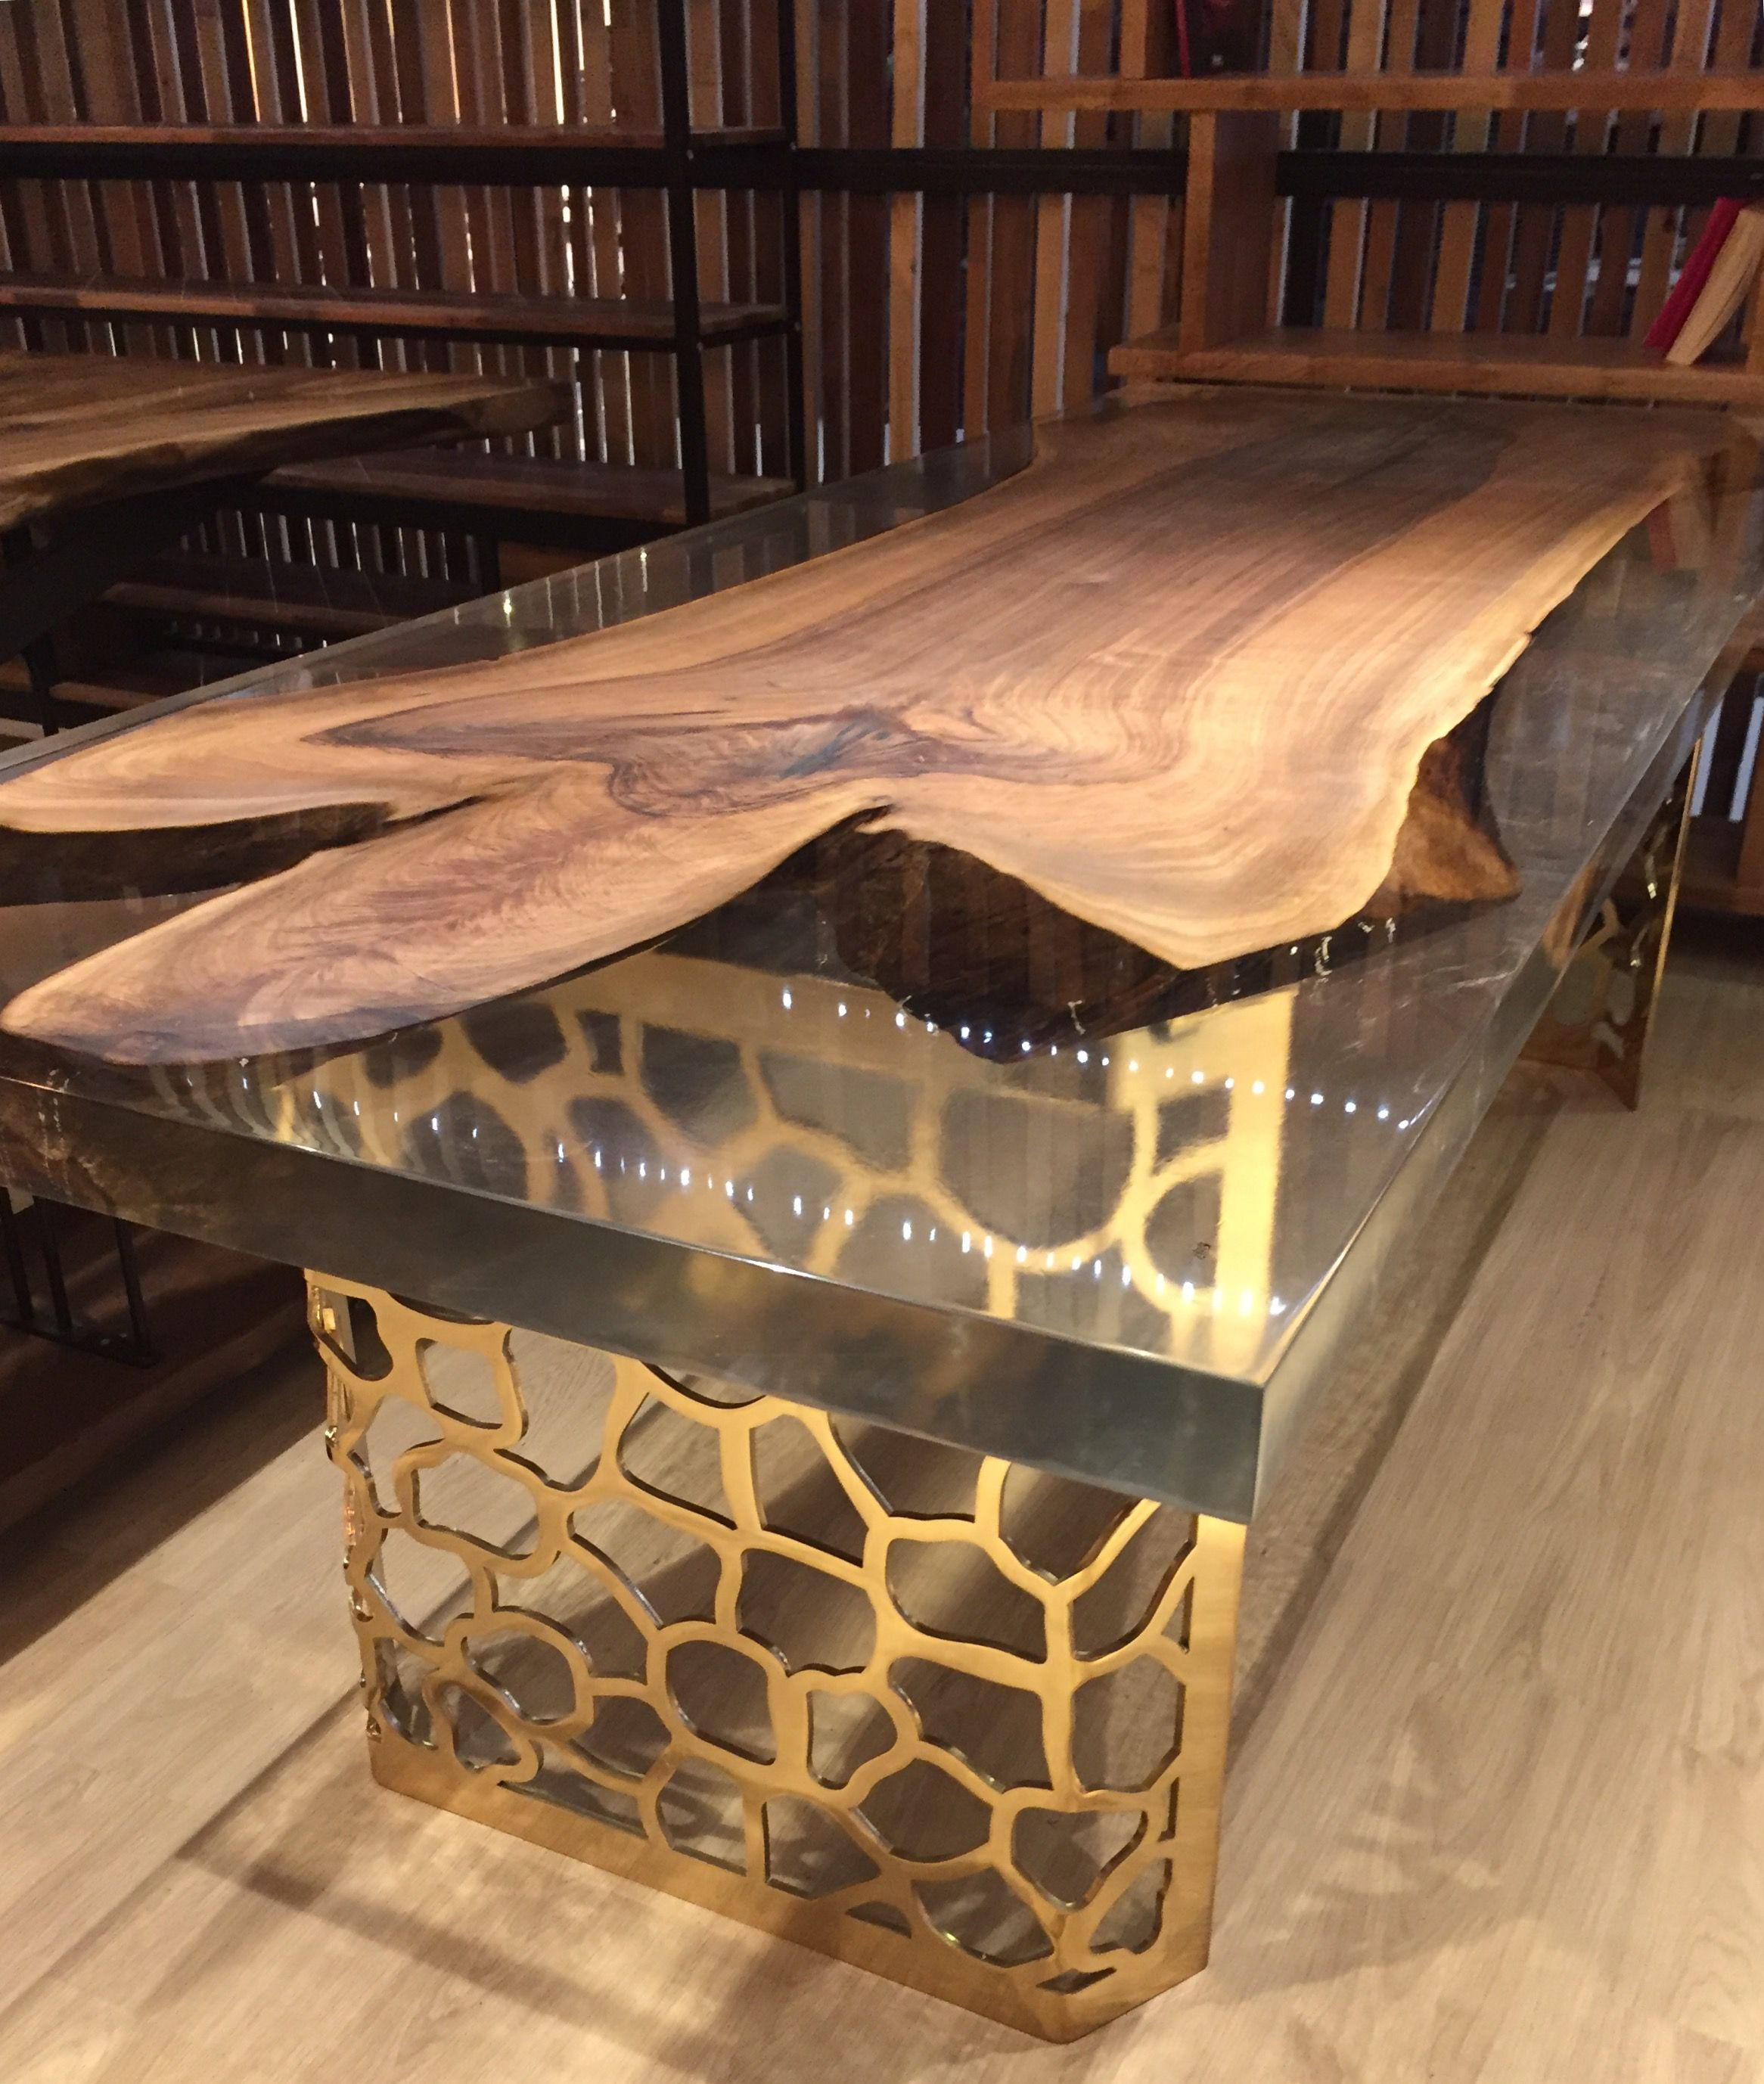 Live Edge Table Epoxy Ankara Resin Woodwork Hobbies Interiors Woodworking Wood Rustic